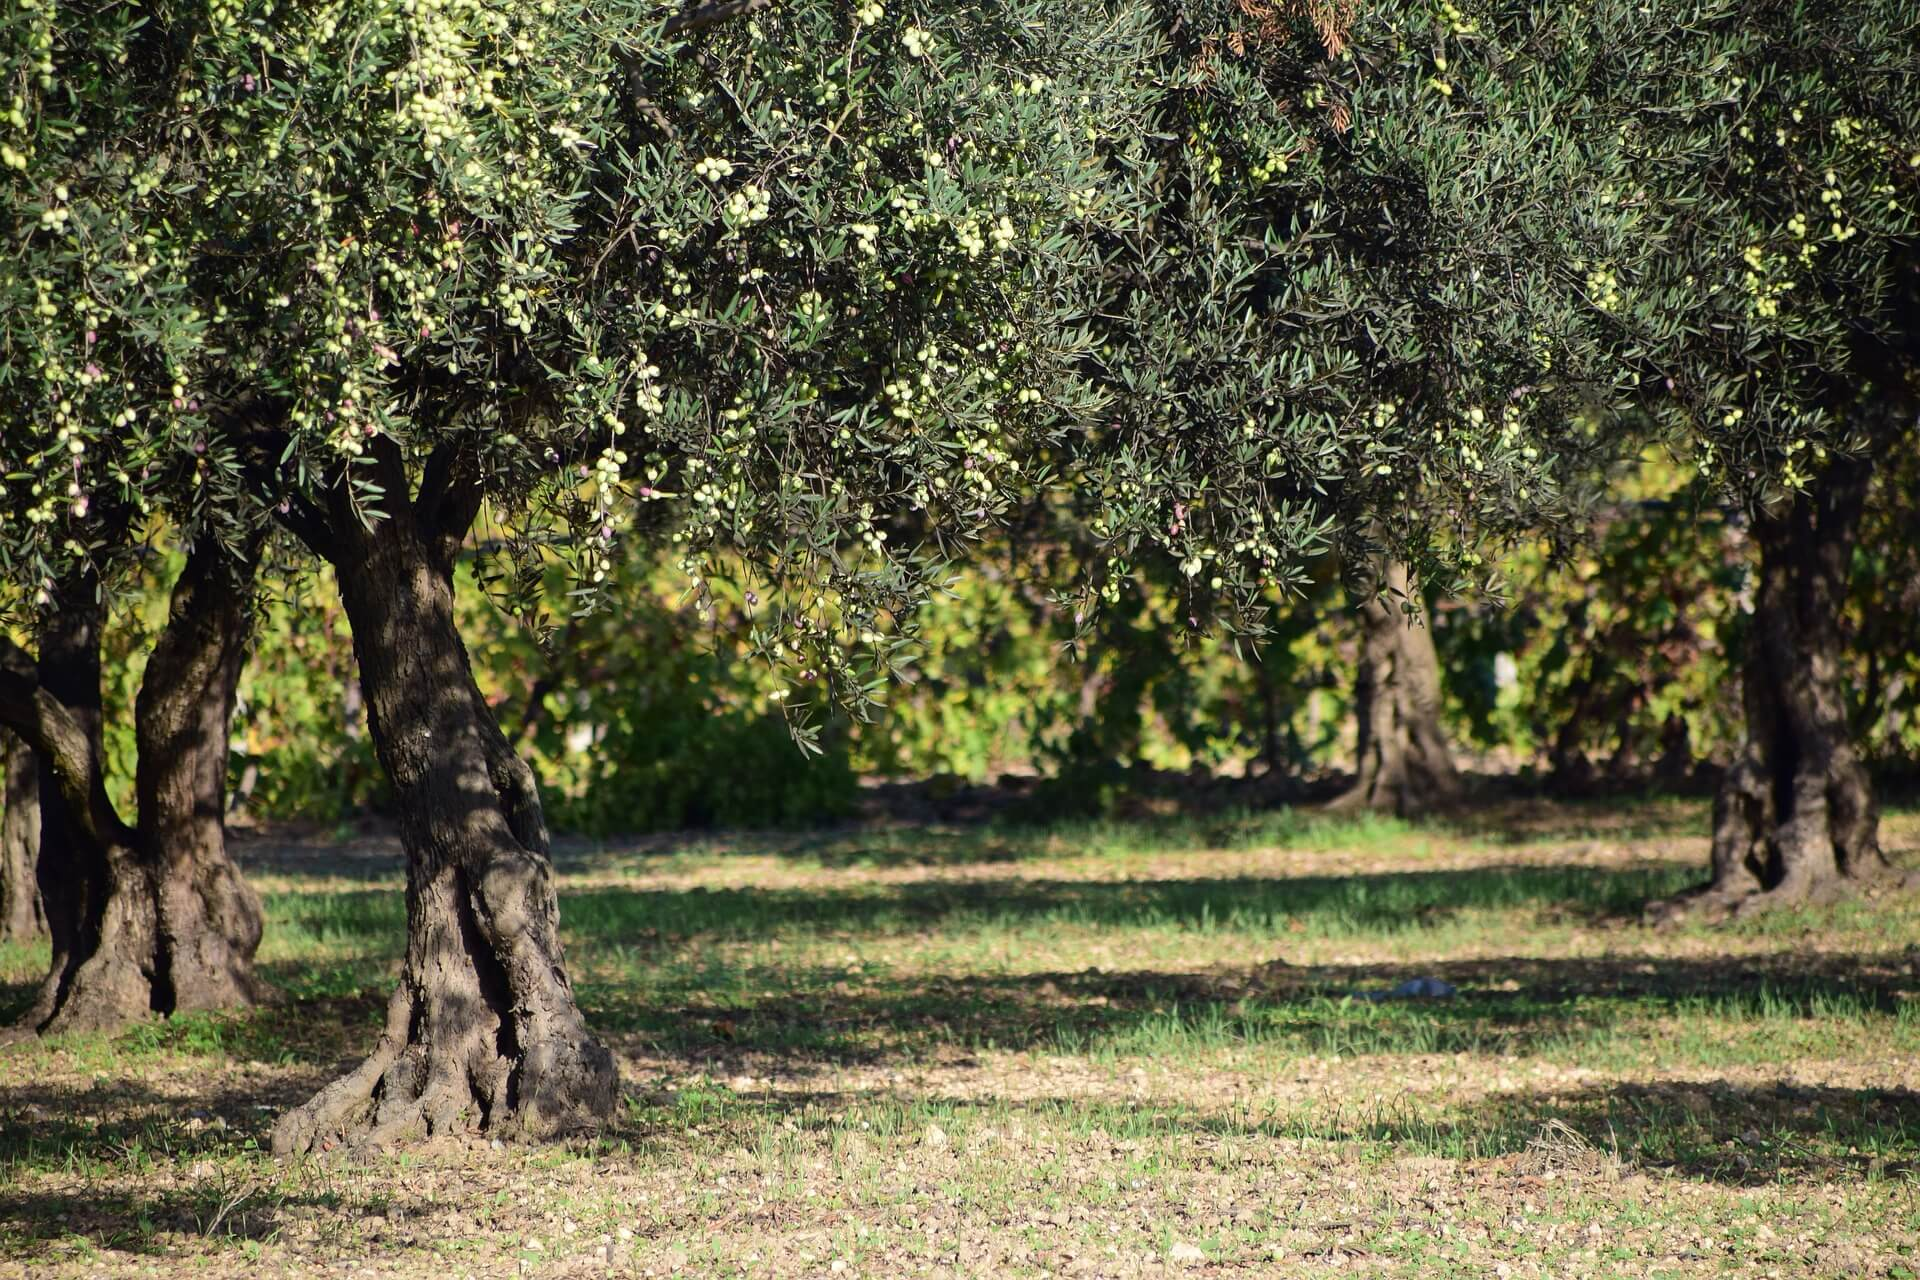 Lakukan Perawatan Pohon Zaitun yang Sudah Ditanam